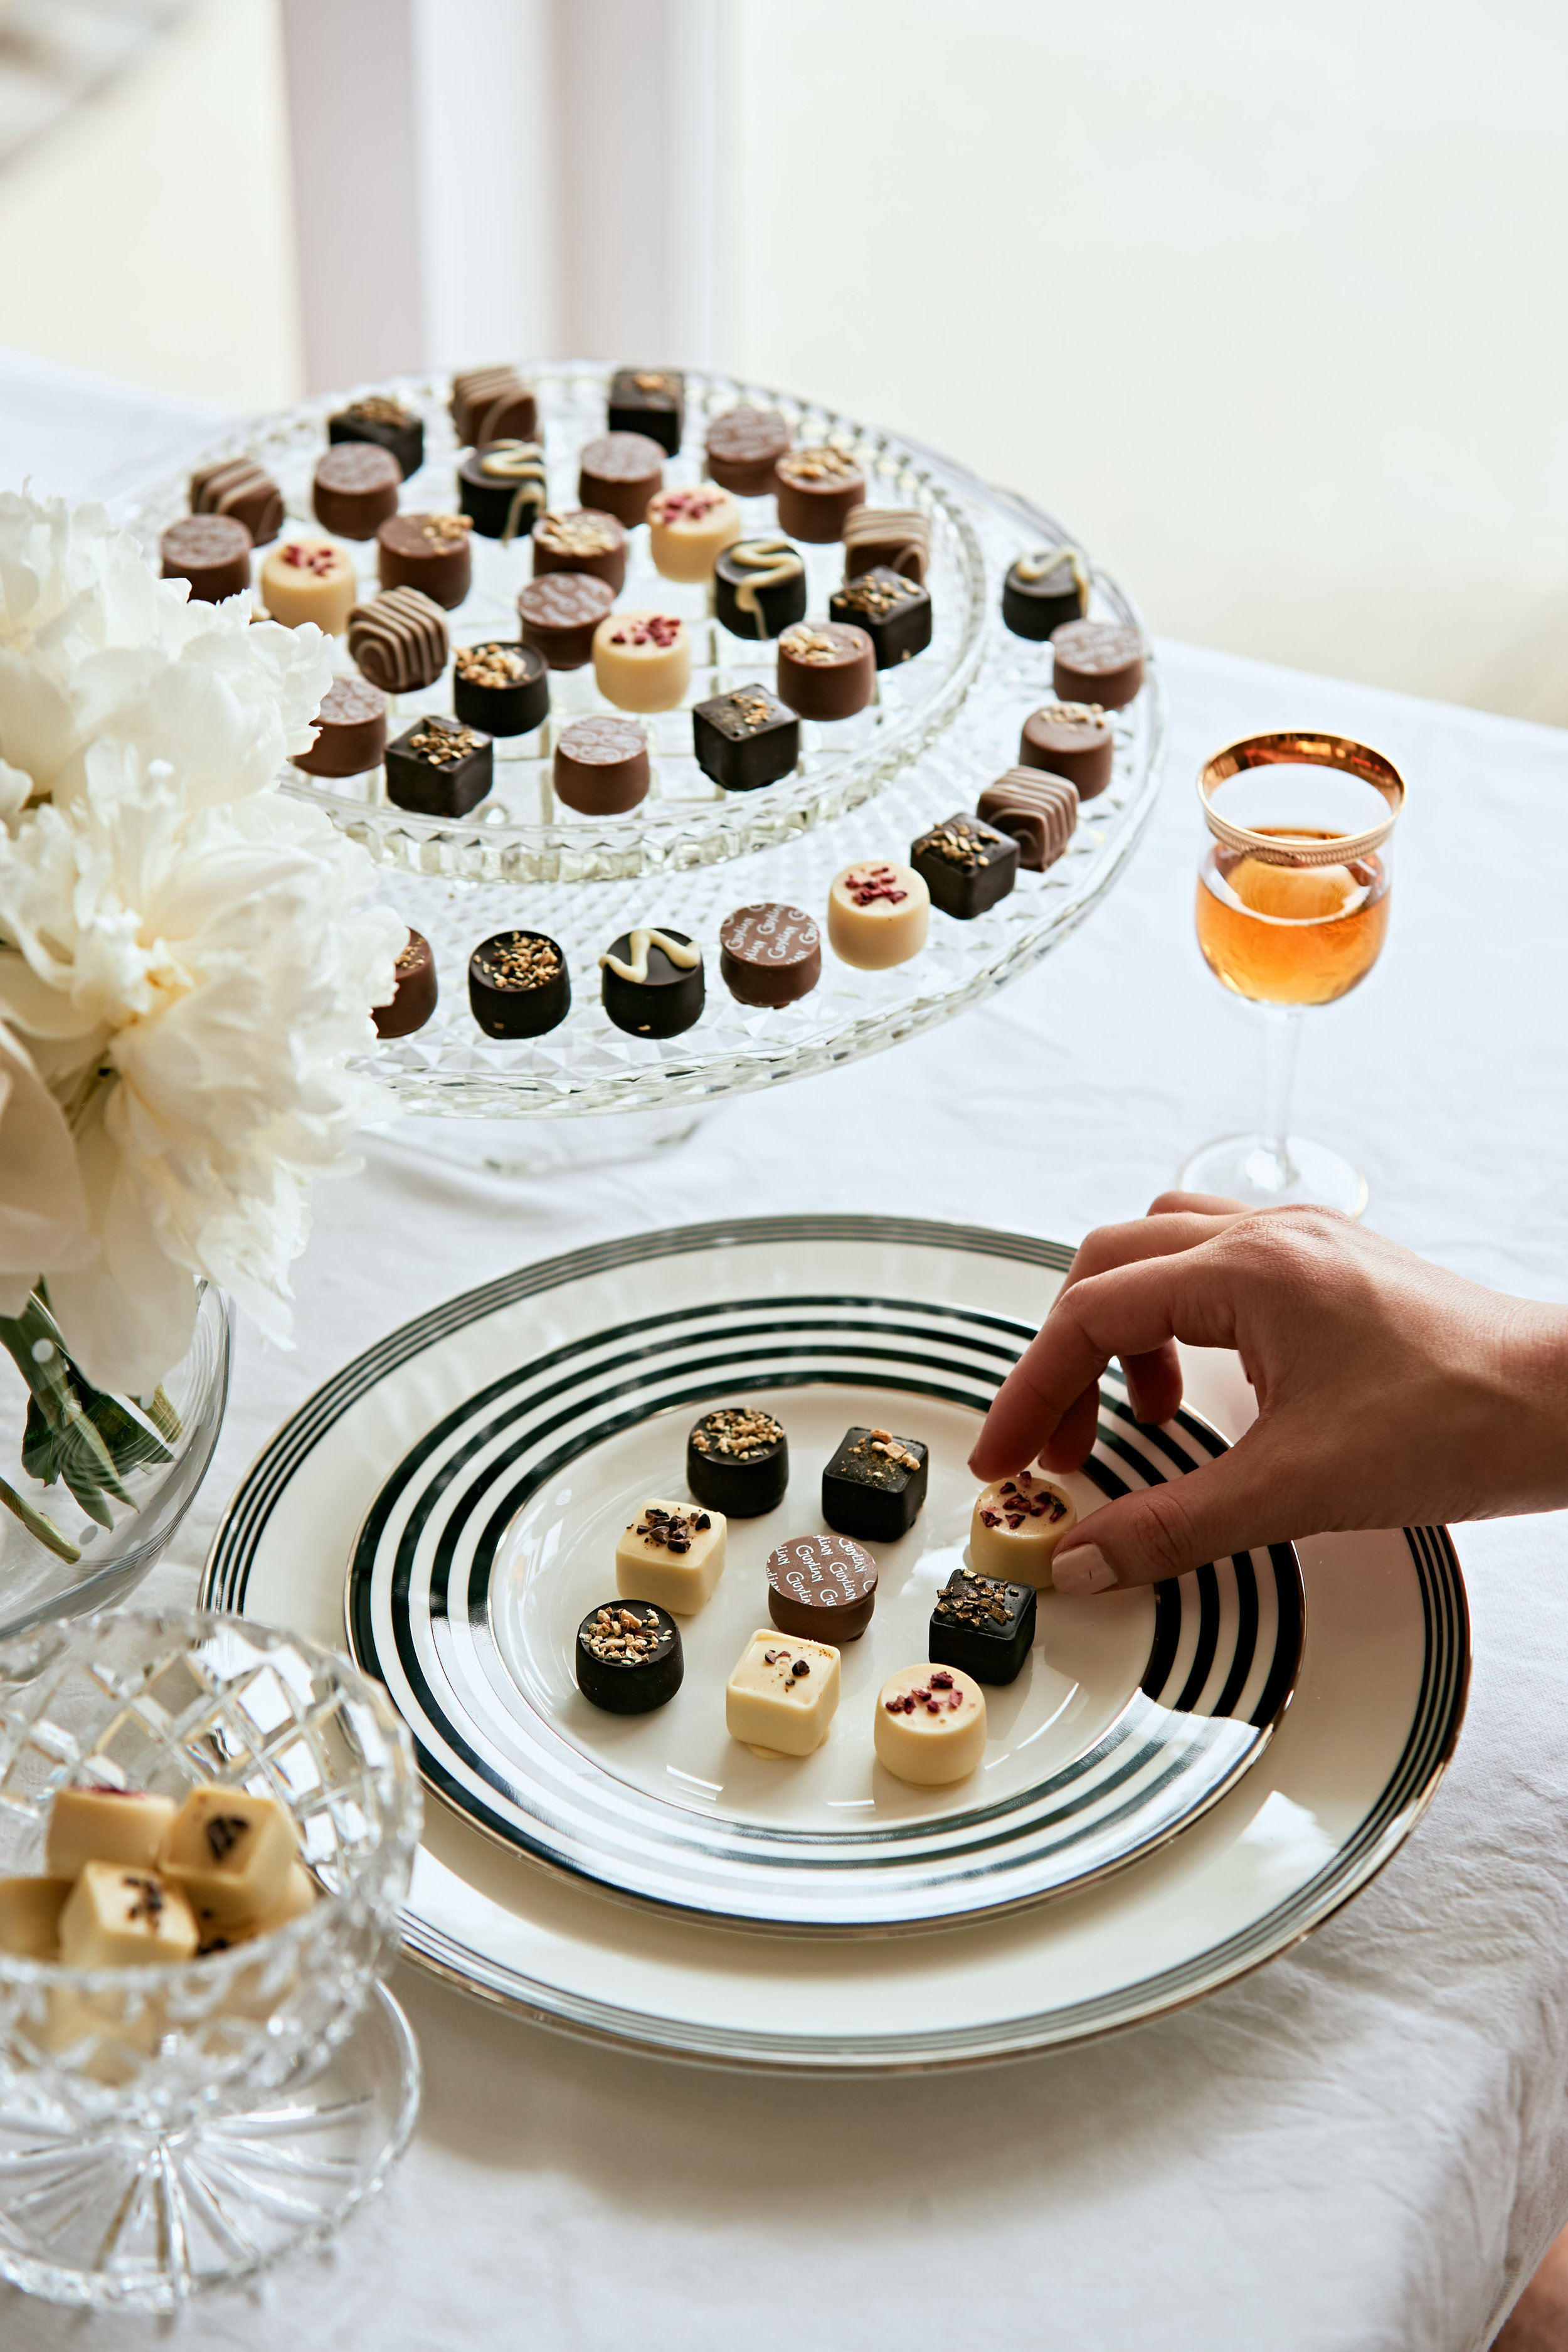 Image BeautyEQ The Guylian Master's selection of praline chocolates.